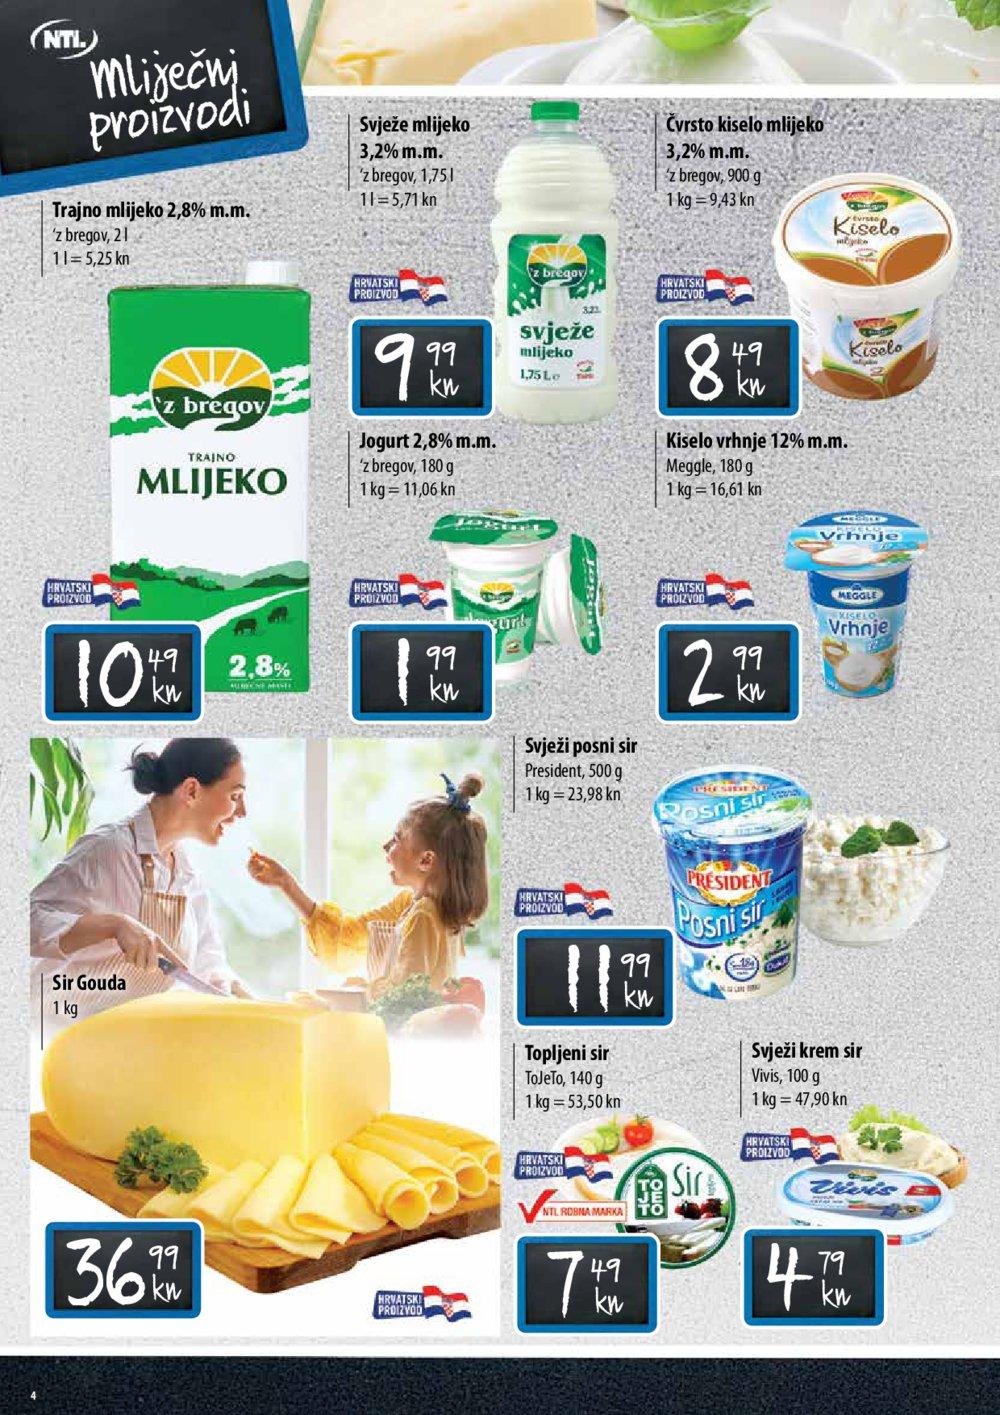 NTL Maxi katalog Akcija 26.03.2020.-01.04.2020.